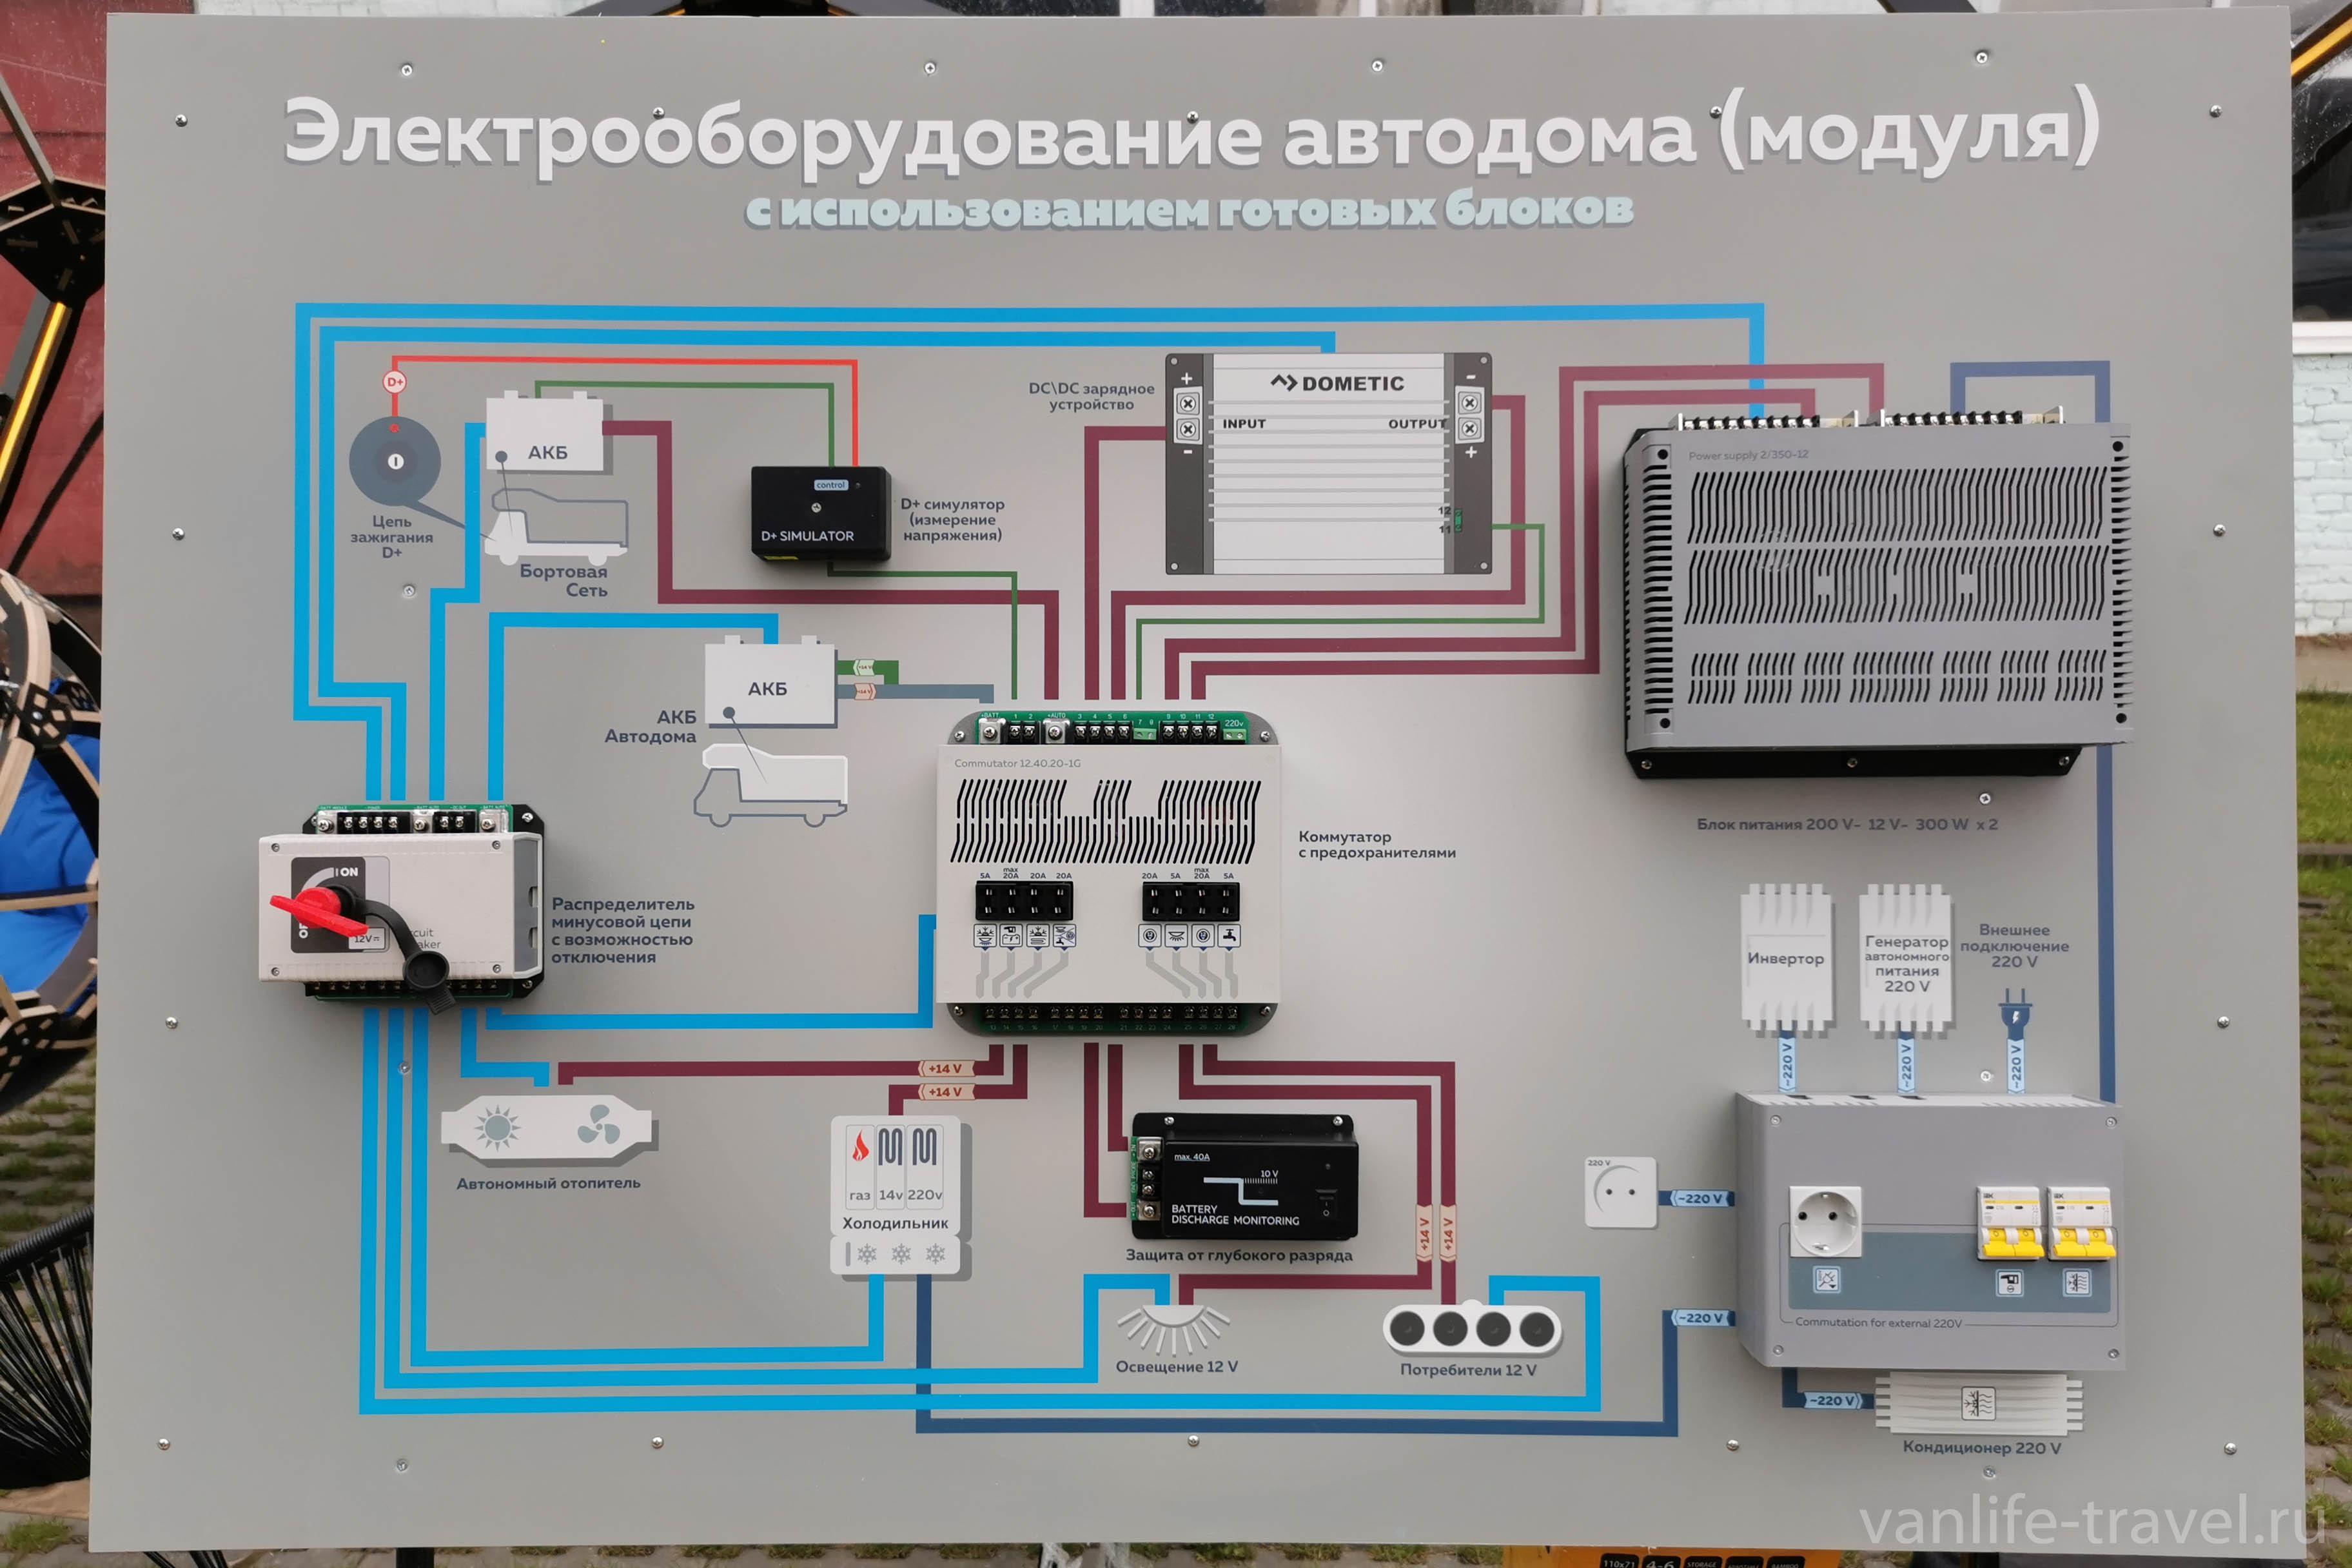 elektrooborudovanie-avtodoma